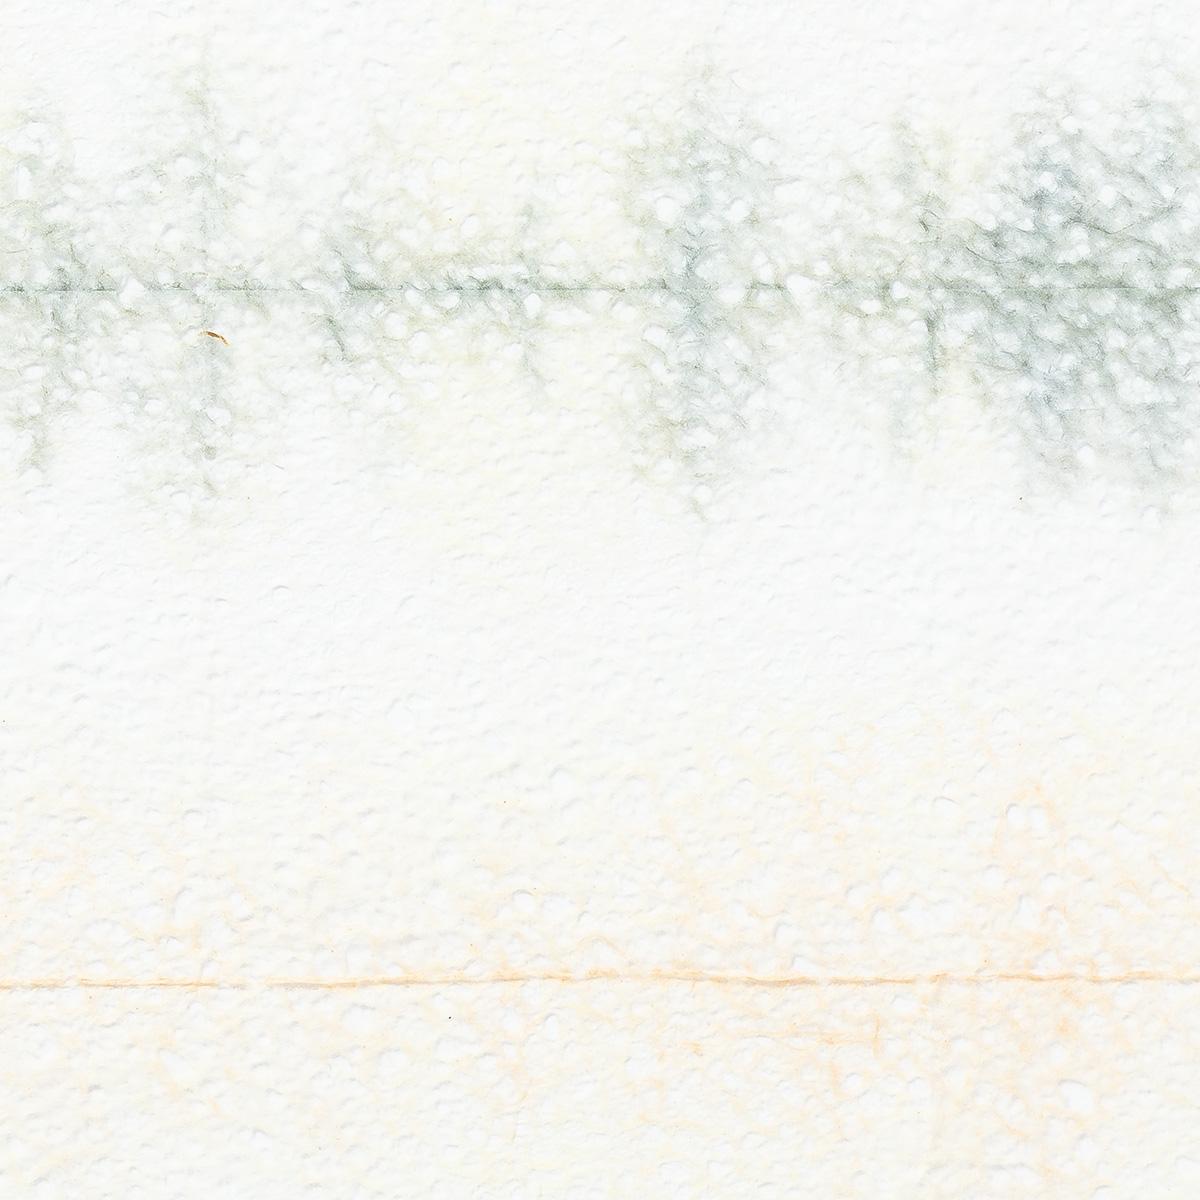 落水紙(春雨)板締め No.13